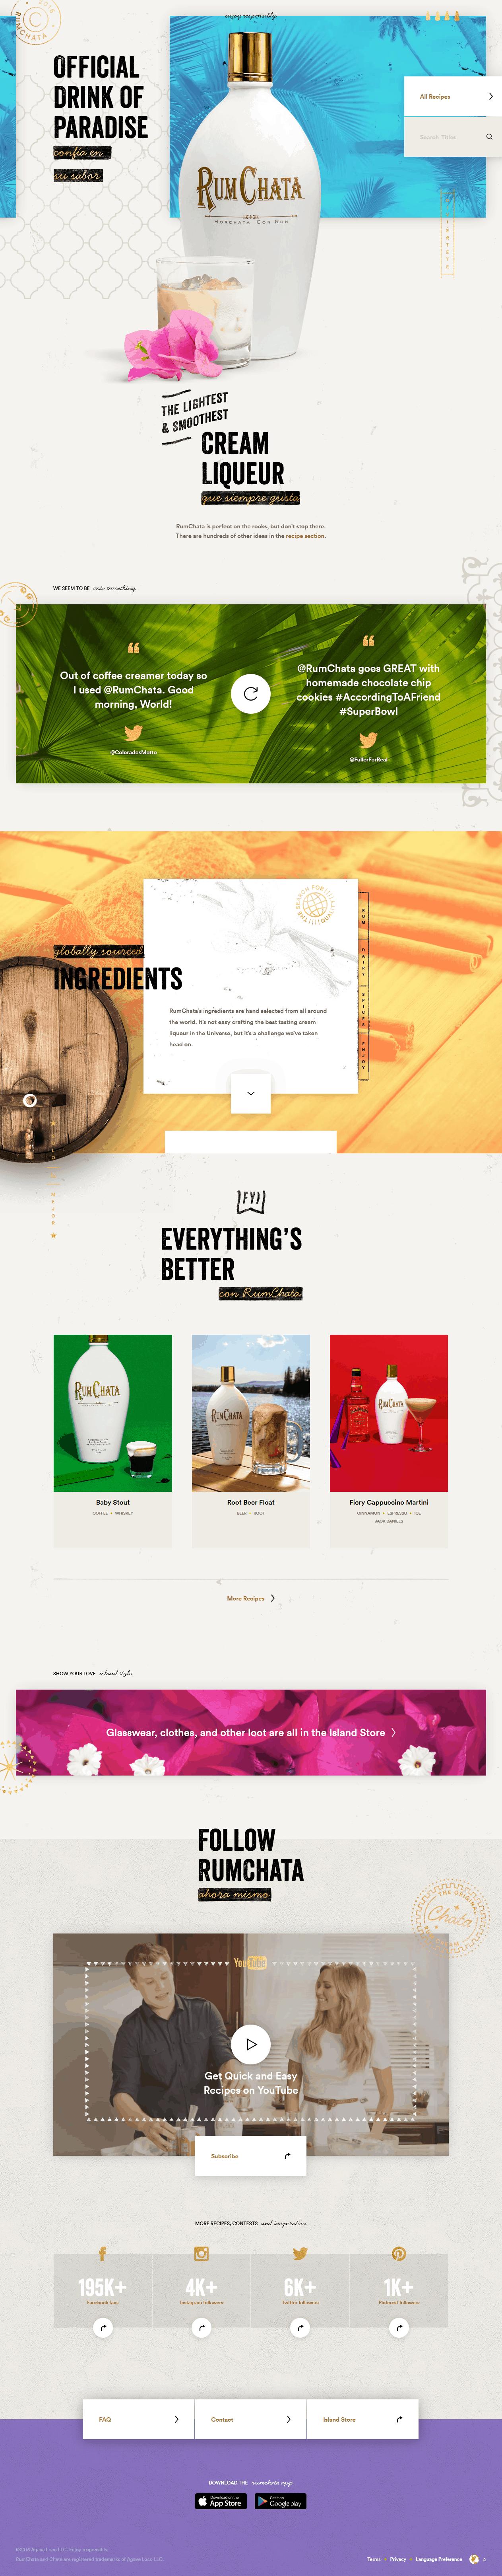 rumchata web design 2016